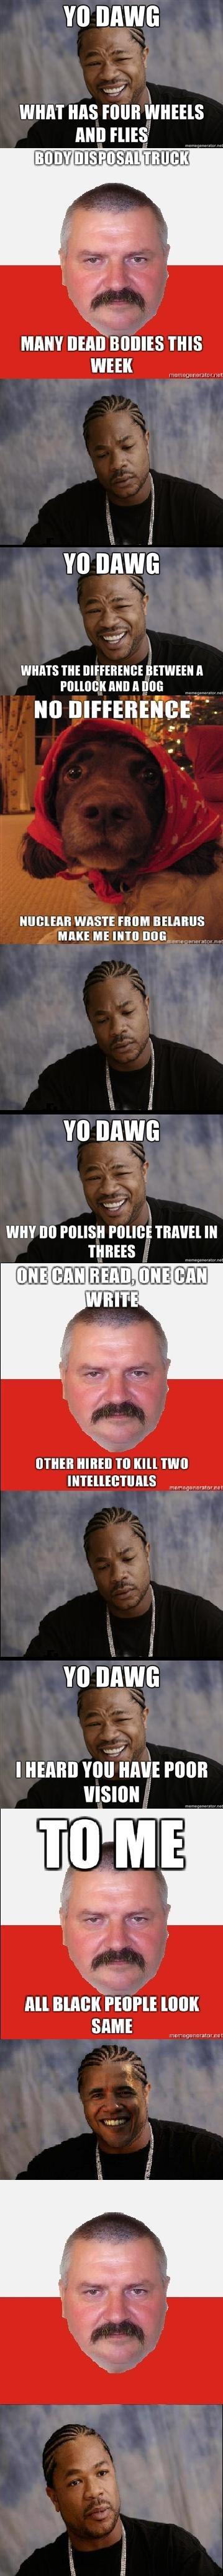 Xzibit: Poland. OC. WHAT nus Eton mists Mum nus WEEK l}_ II Mill I QUE WASTE ! BELARUS raj irdi, WHY no I' ruling mum Ill unm: alumni In mu WIN] iii'. U Mad Anon get an account or shut the up Xzibit: Poland OC WHAT nus Eton mists Mum WEEK l}_ II Mill I QUE WASTE ! BELARUS raj irdi WHY no I' ruling mum Ill unm: alumni In mu WIN] iii' U Mad Anon get an account or shut the up